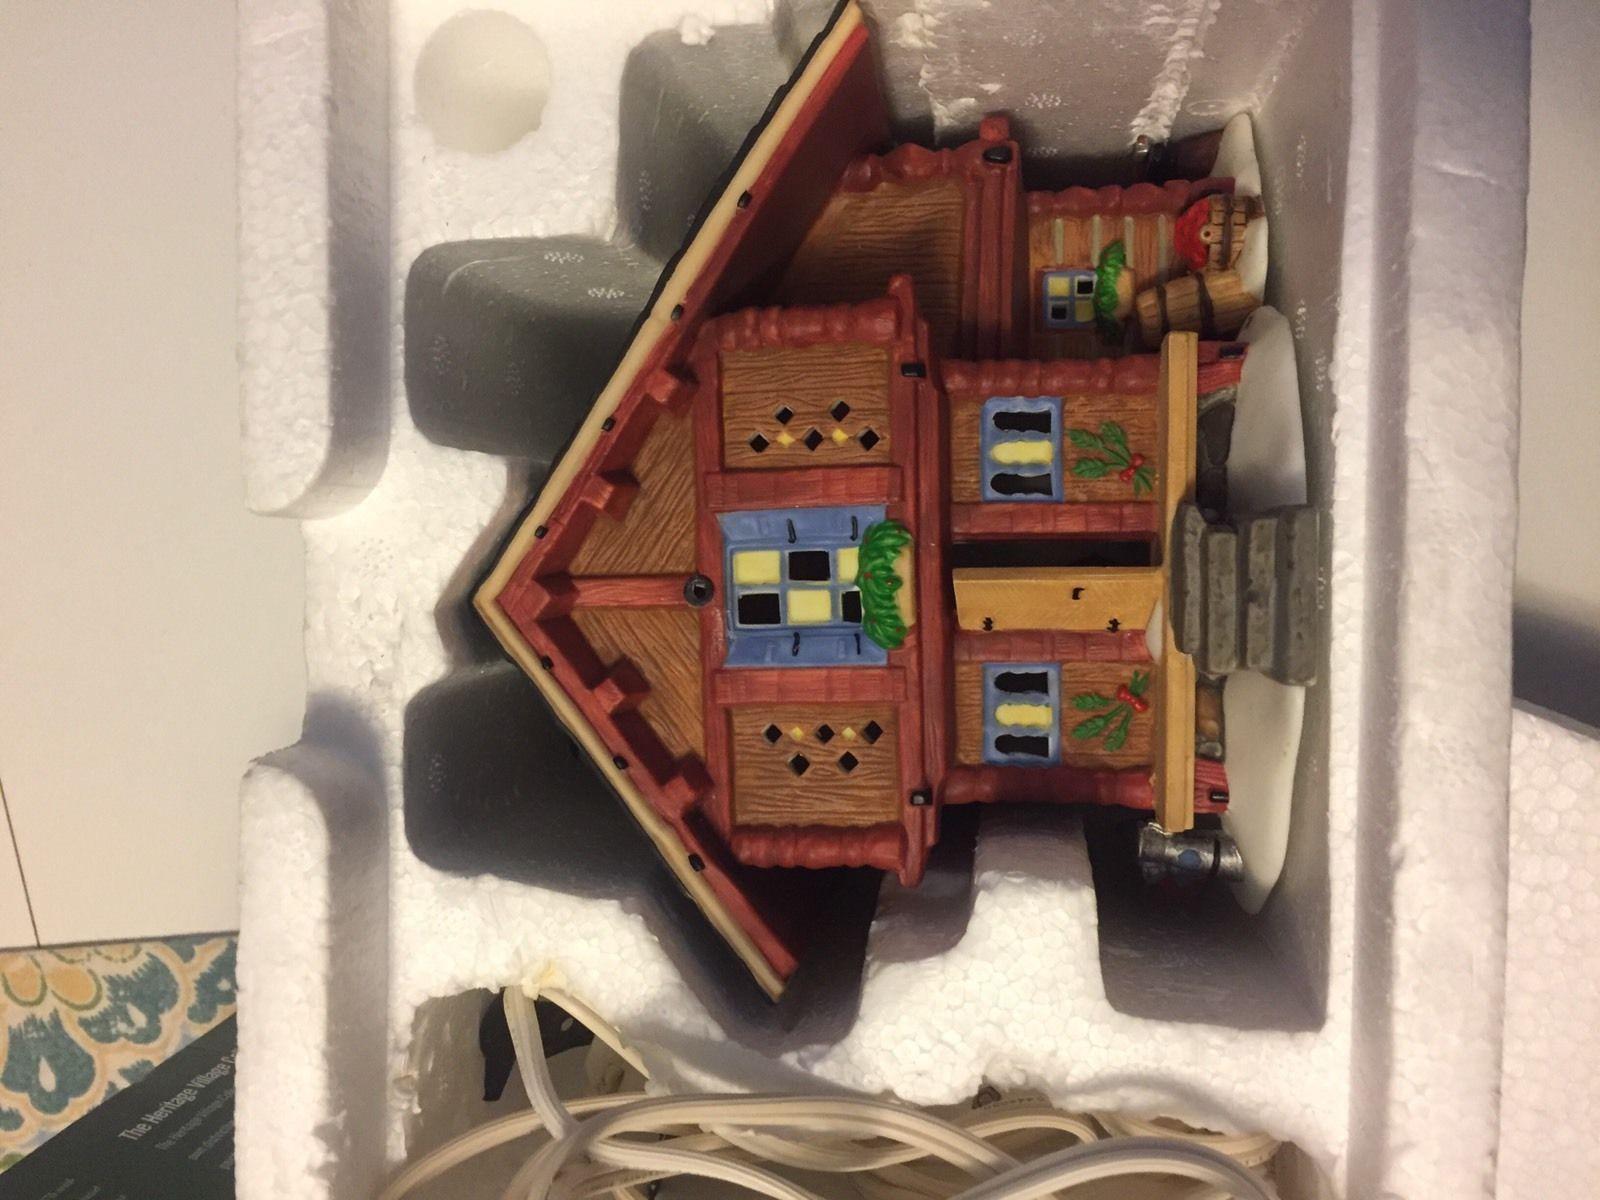 Department 56 Alpine Village Series Heidi's Grandfather's House MINT in Box